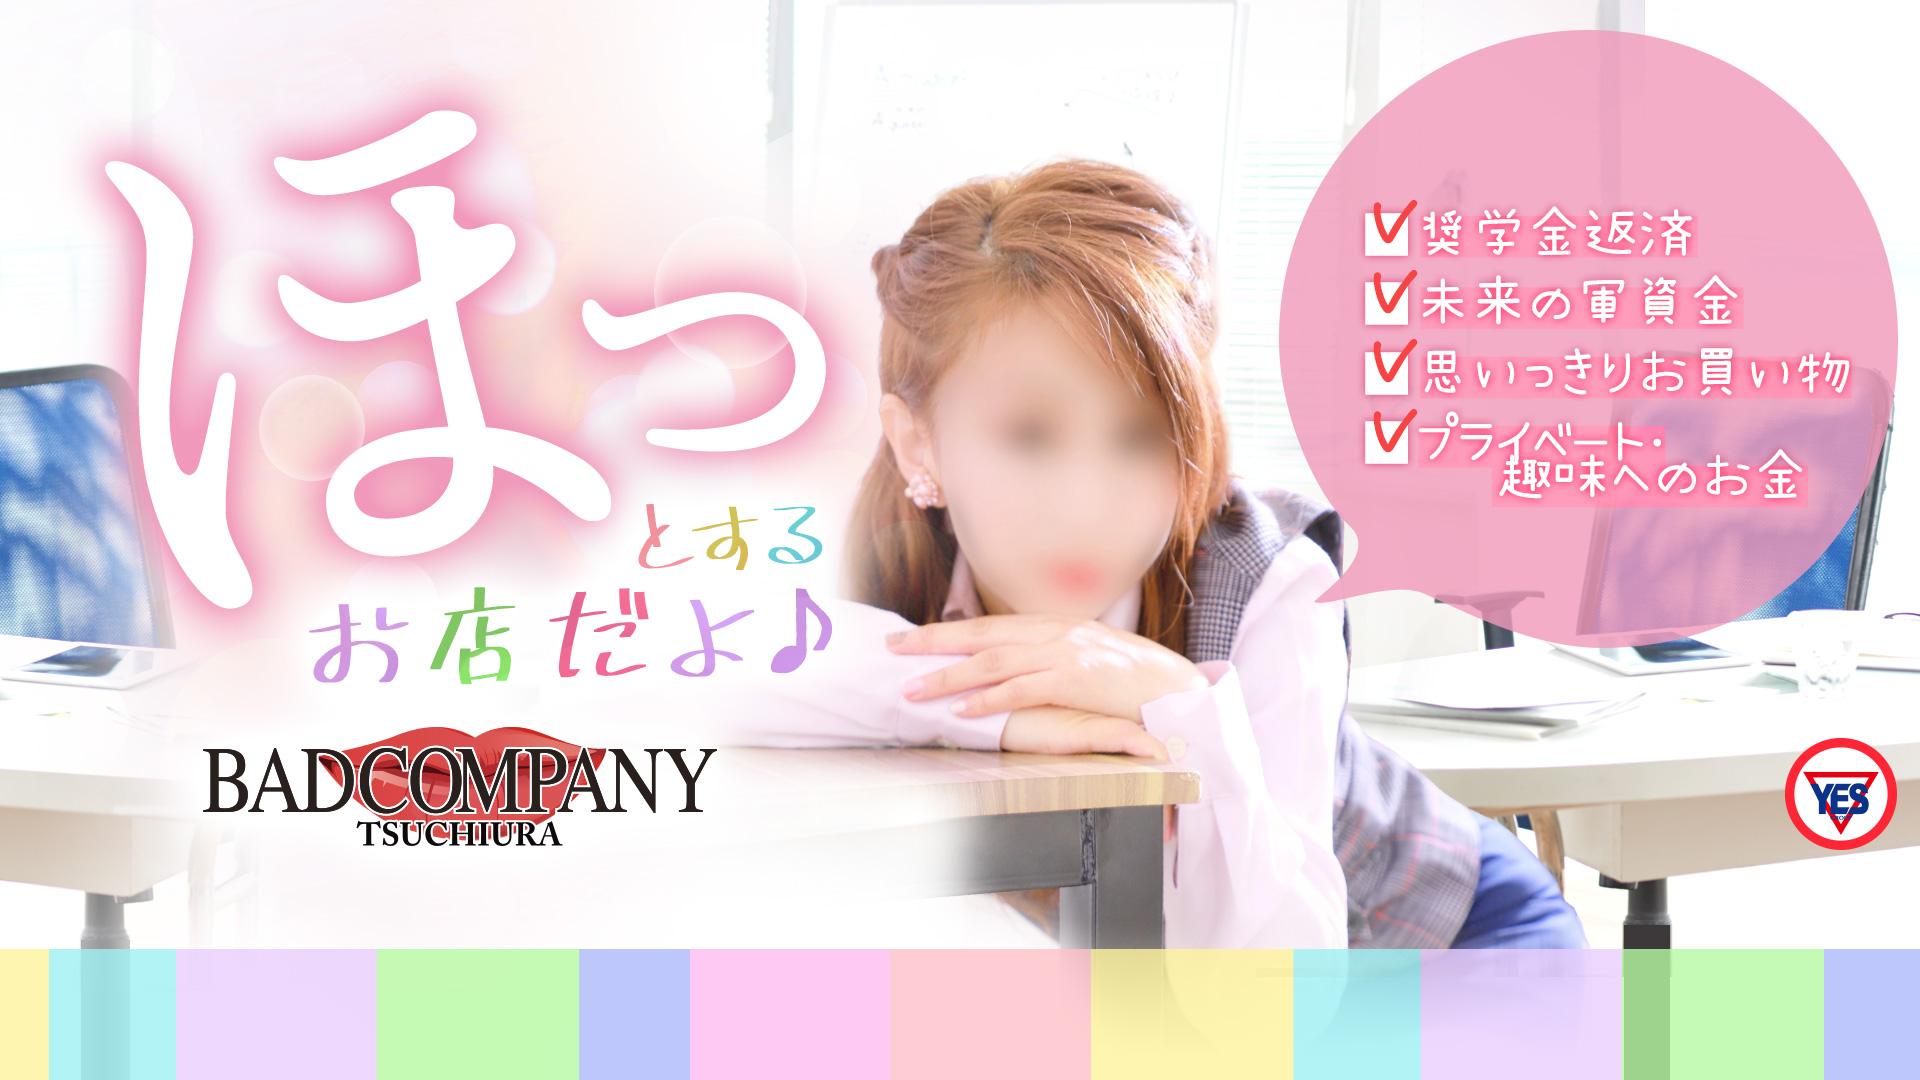 BAD COMPANY 土浦 YESグループの求人画像